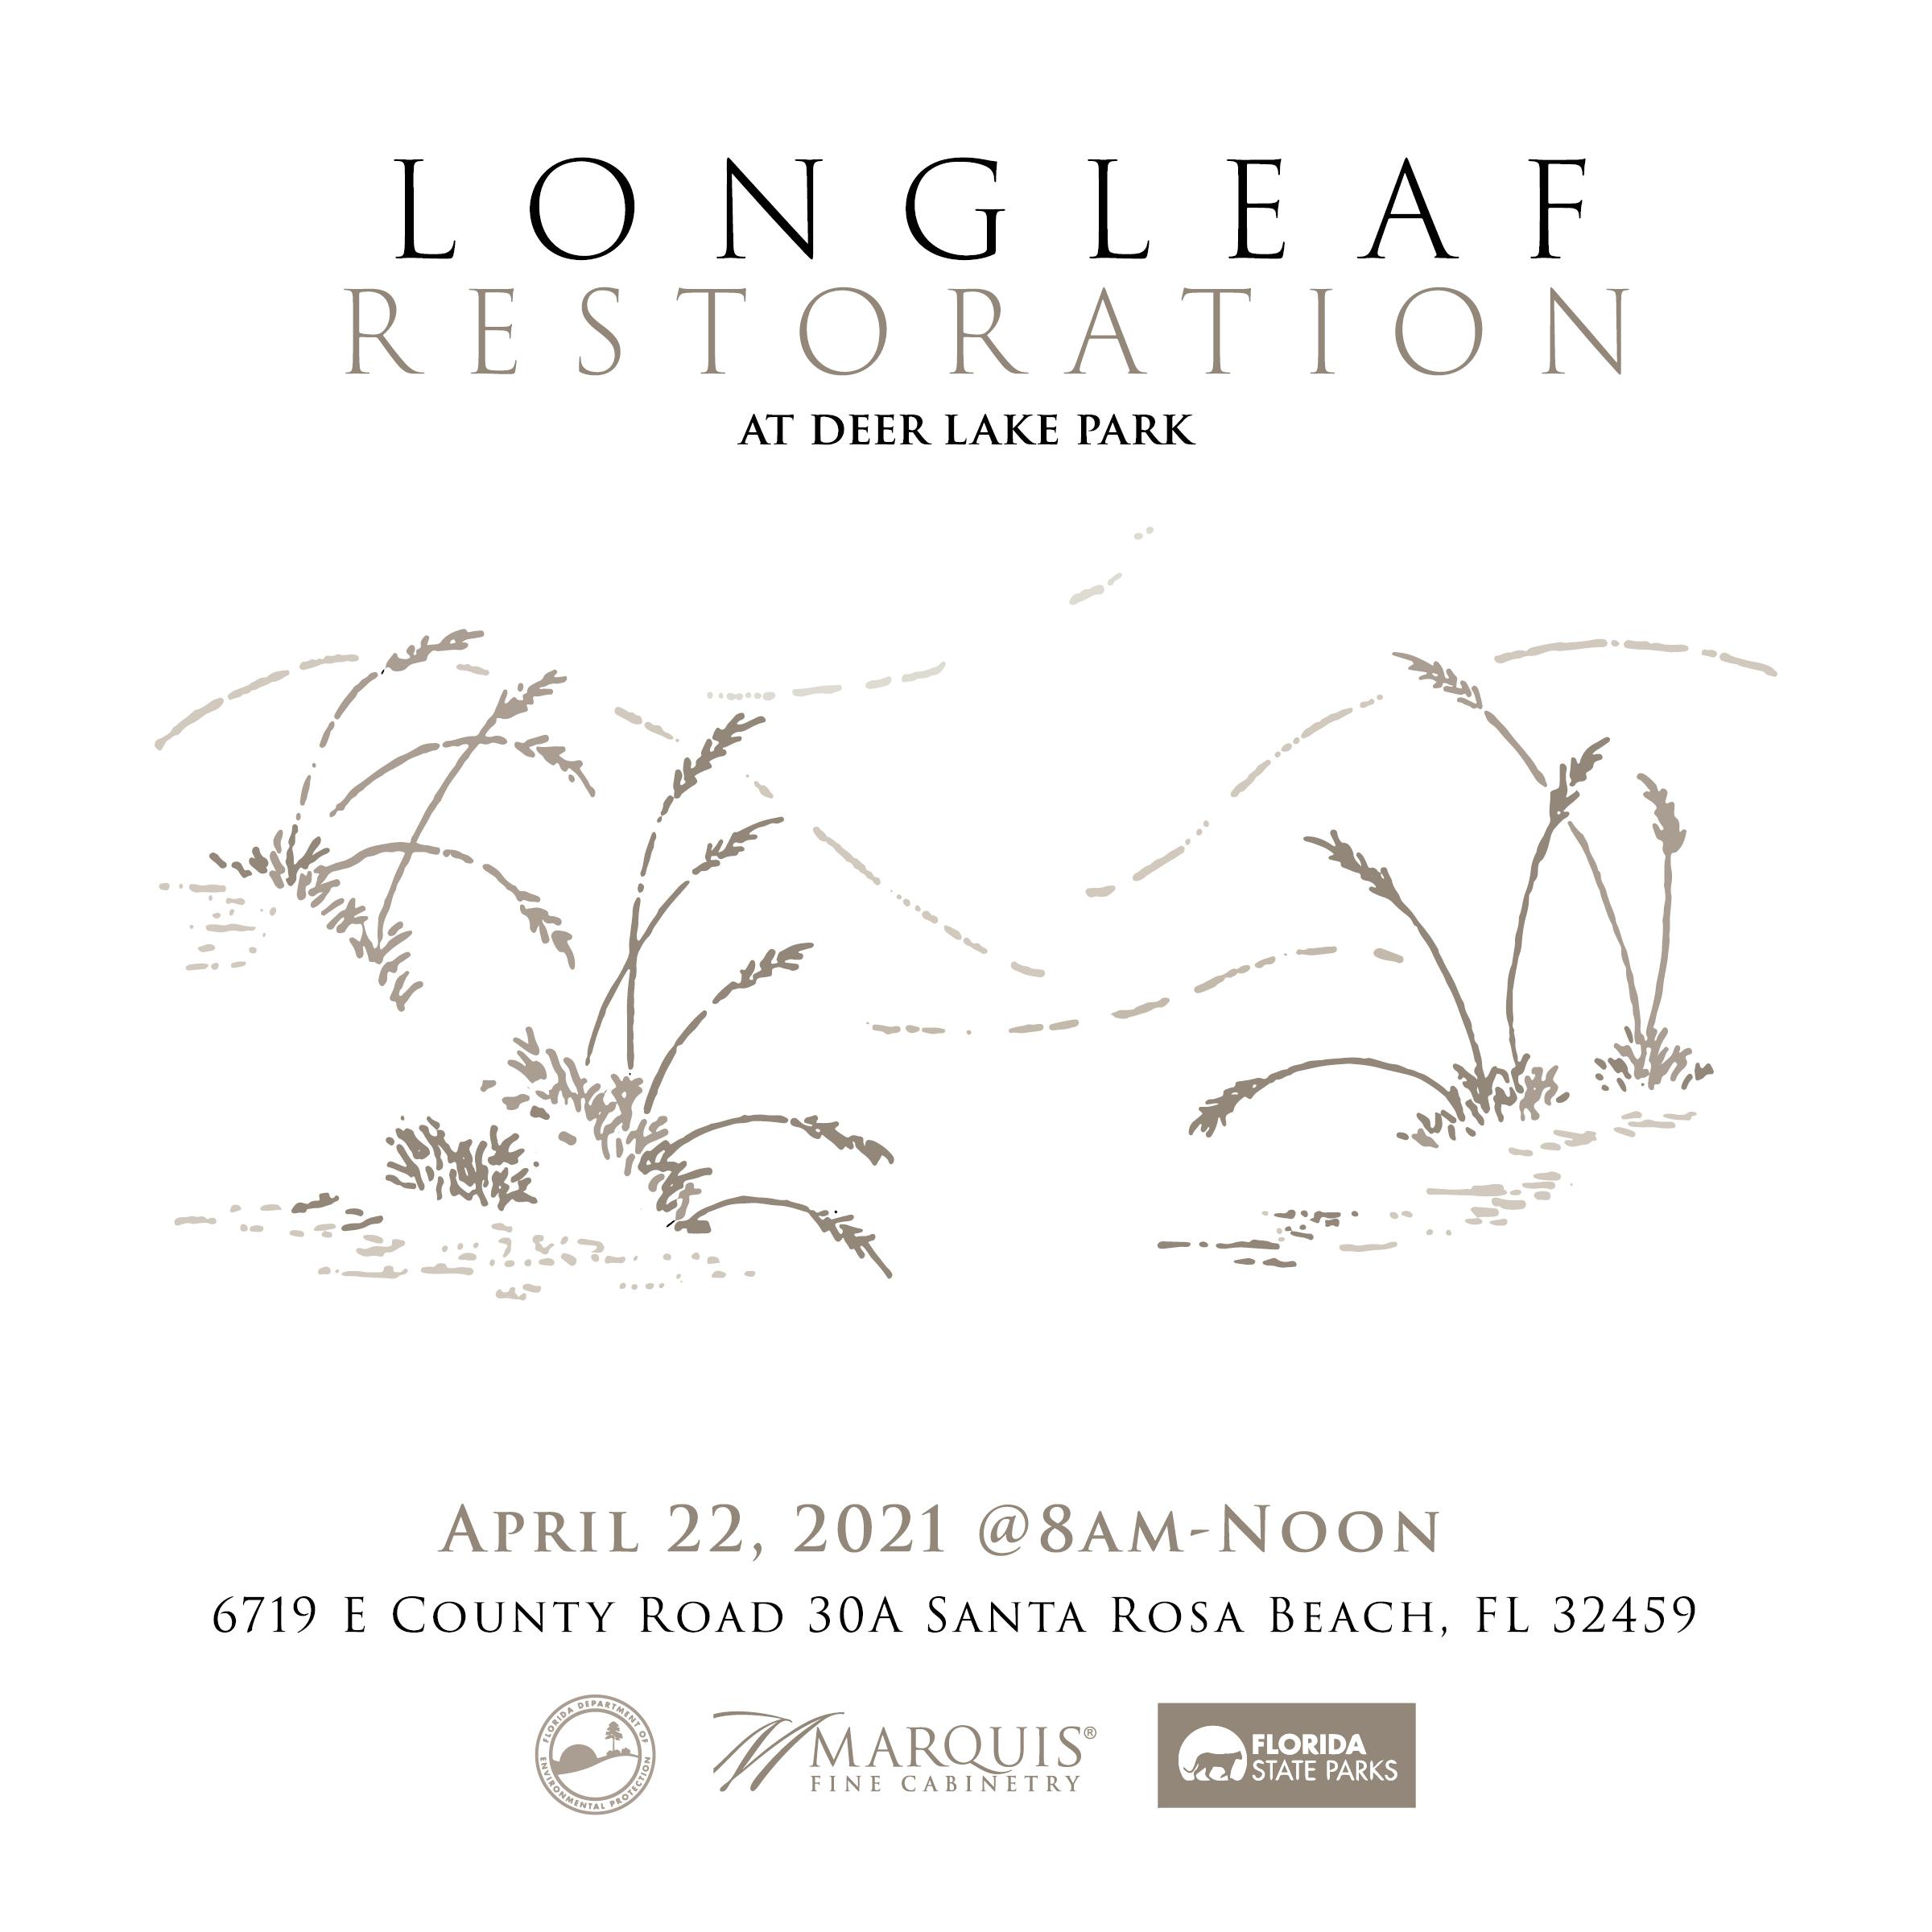 Earth Day 2021 longleaf pine restoration project